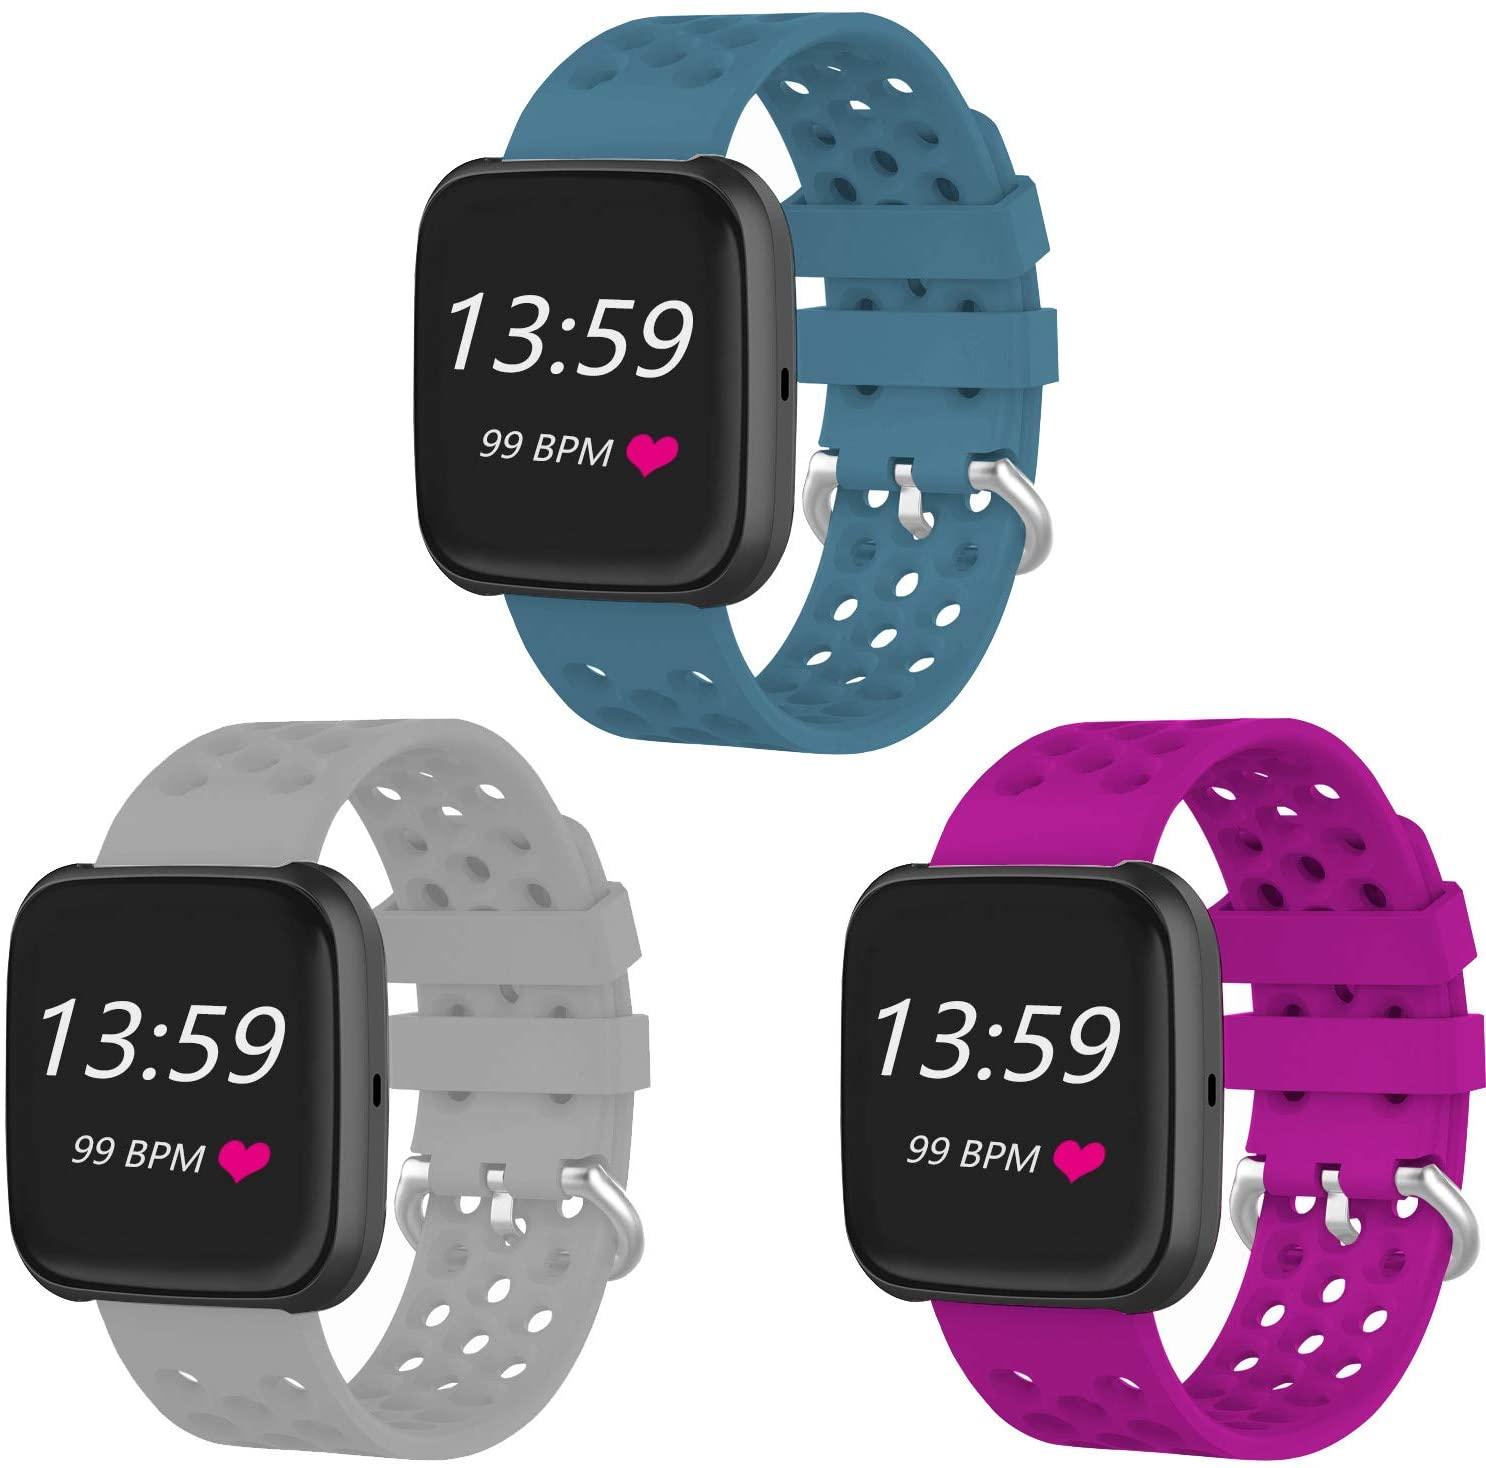 VINIKI 3Pcs Sport Bands Compatible with Fitbit Versa/Versa 2/Versa Lite/SE Special Edition Adjustable Sport Wristbands (Slate,Grey,Rose/Small Size)